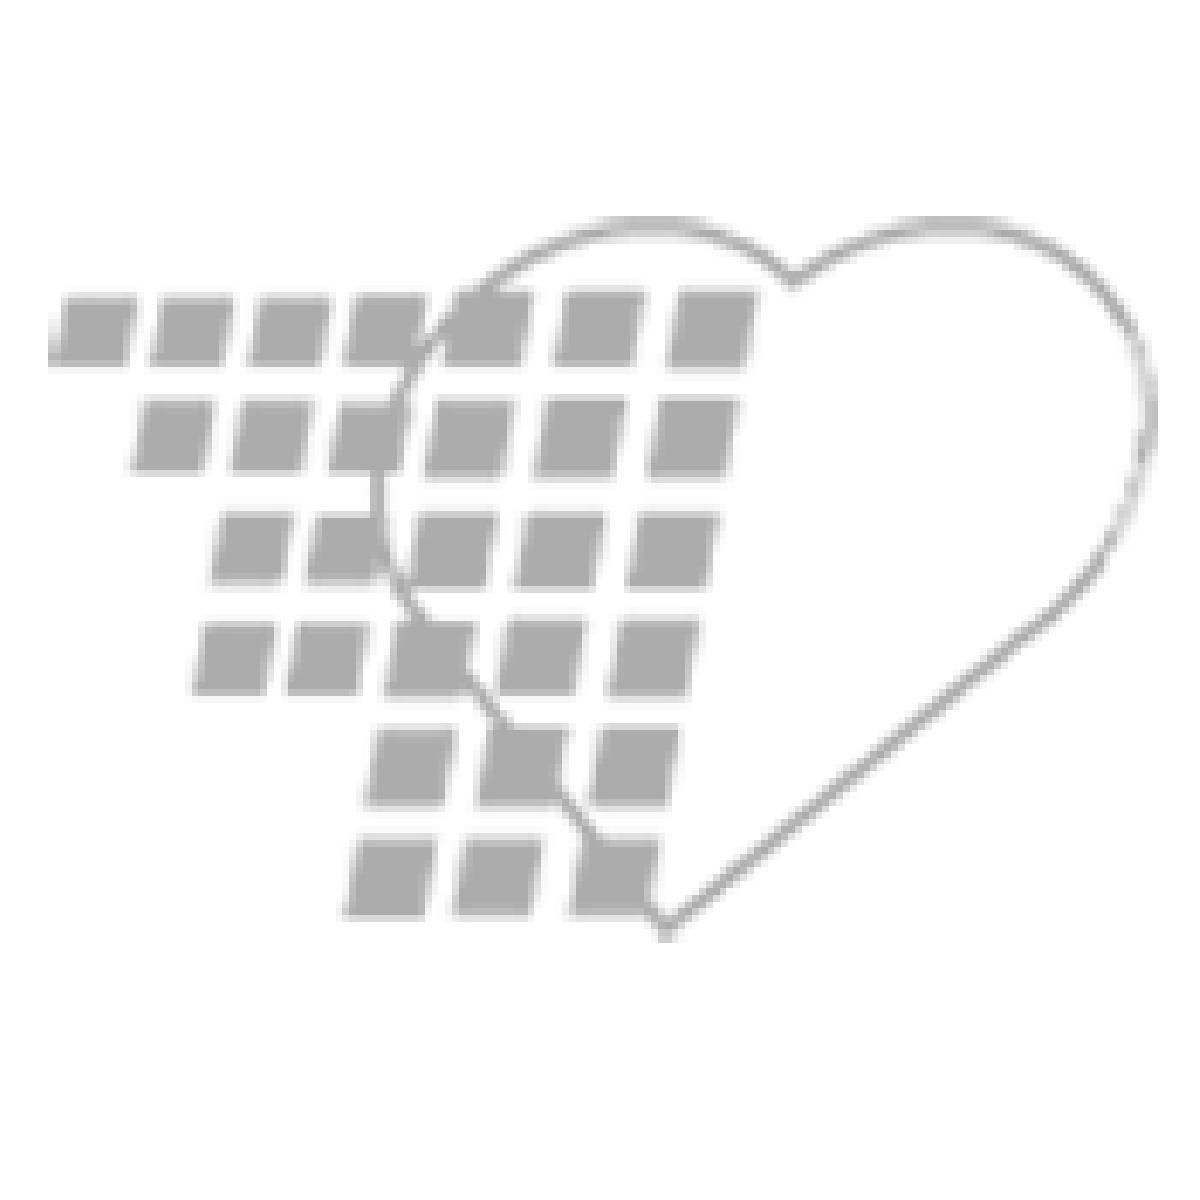 11-81-4001 Nasco Life/form® GERi™ Complete Nursing Skills Manikin